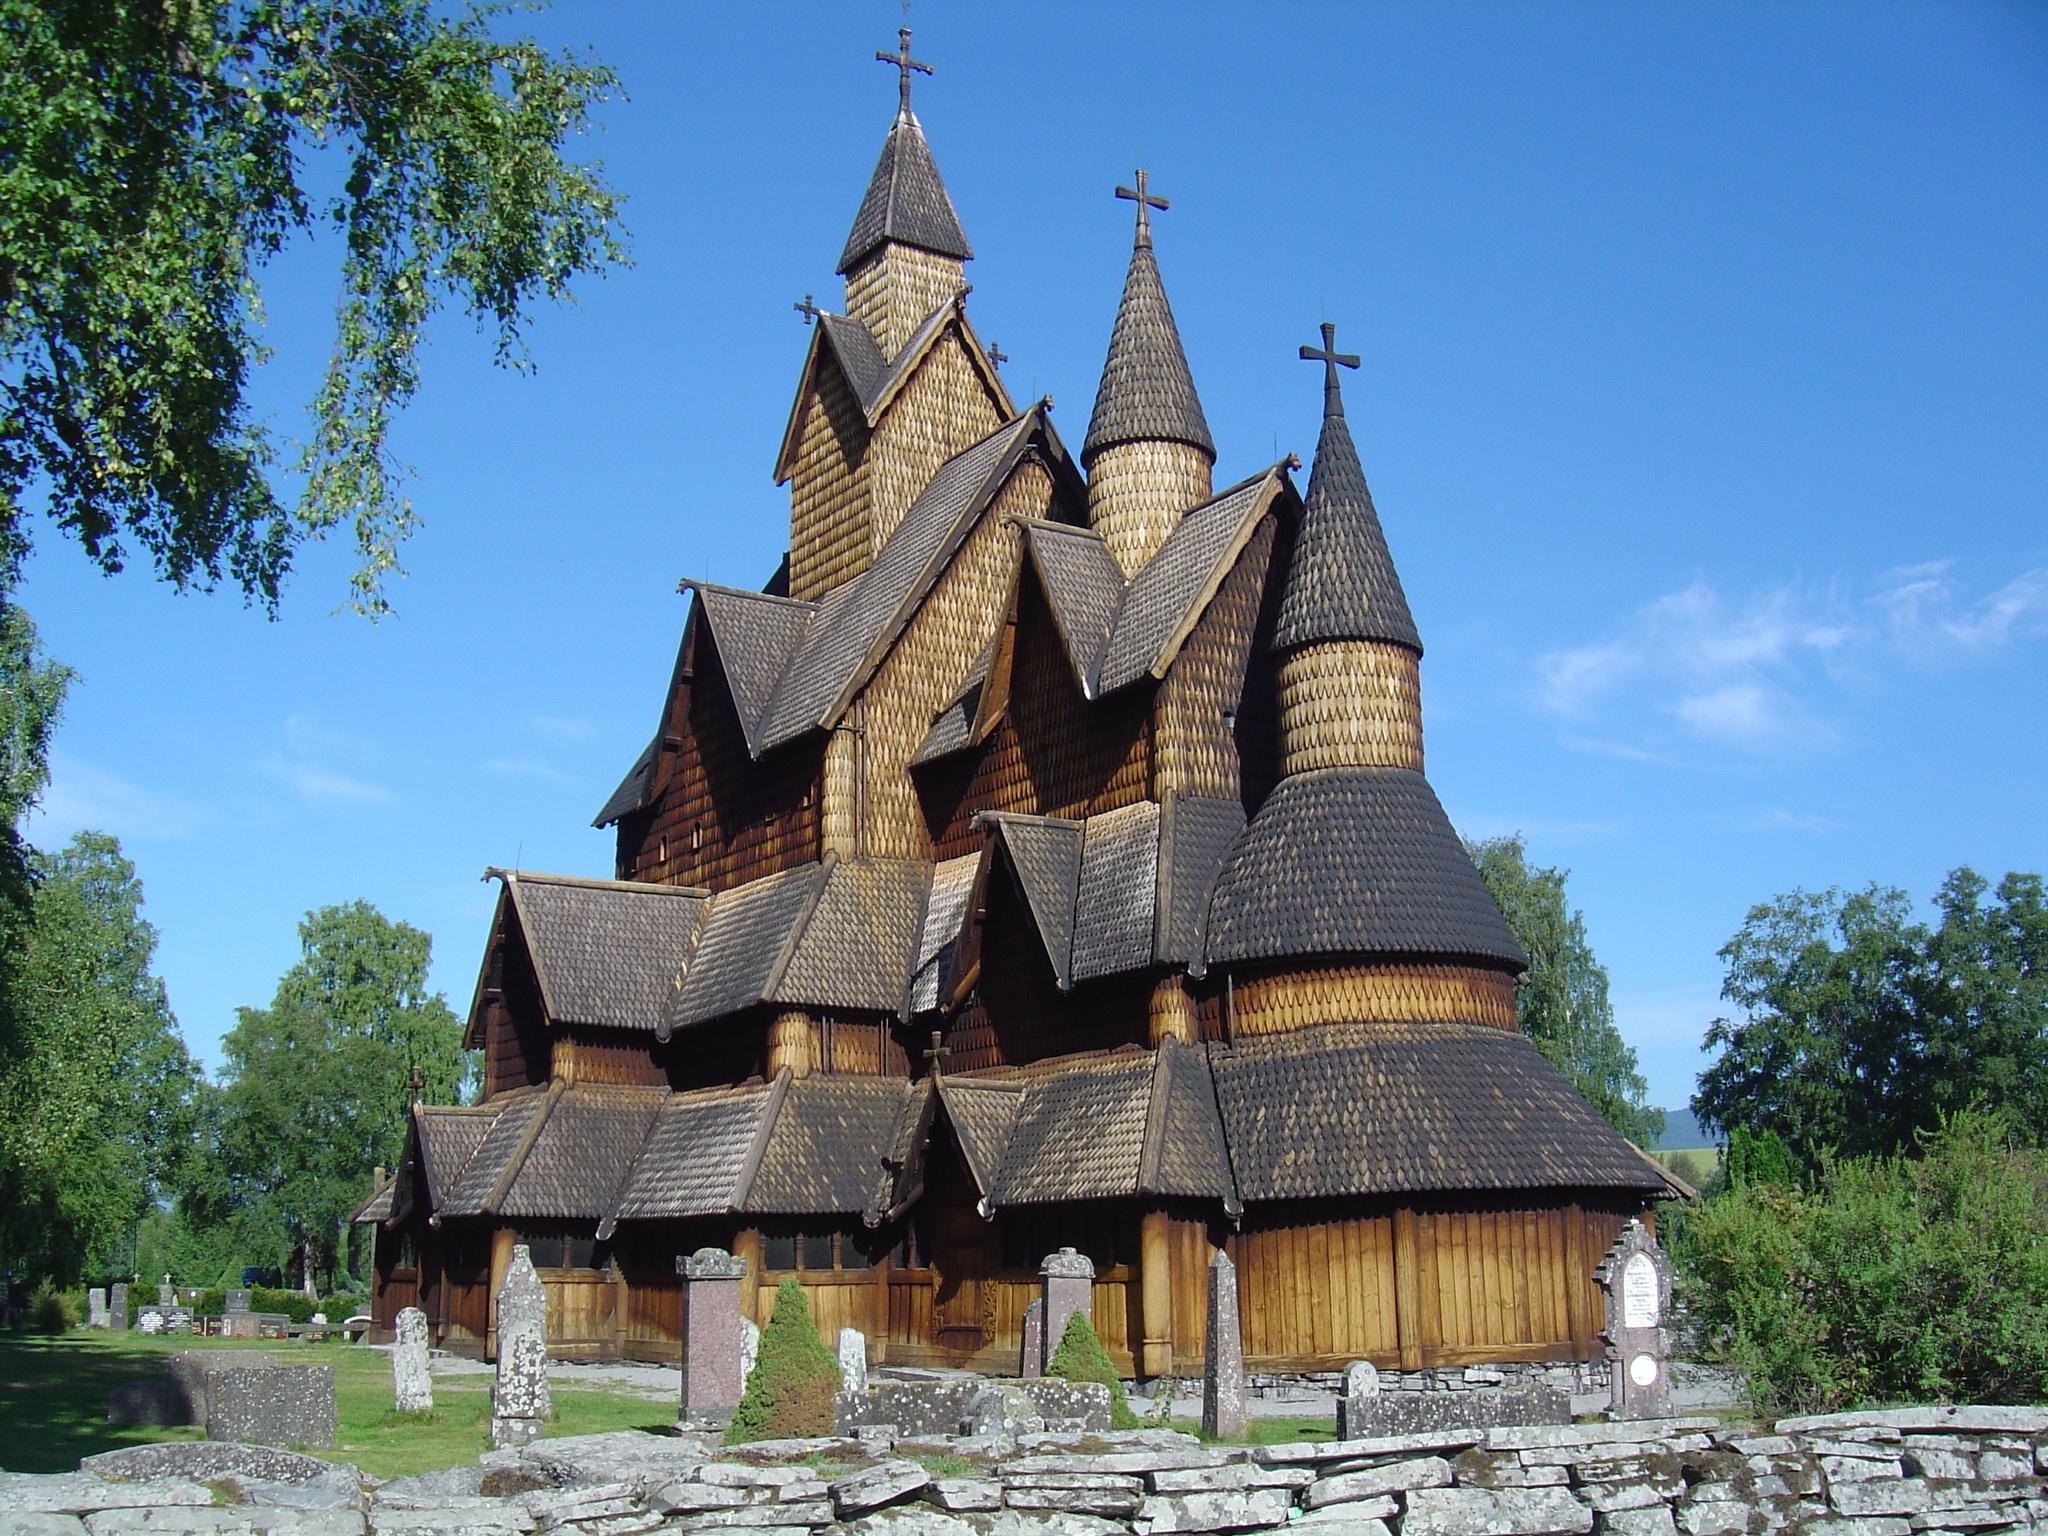 Telemark - Norvège